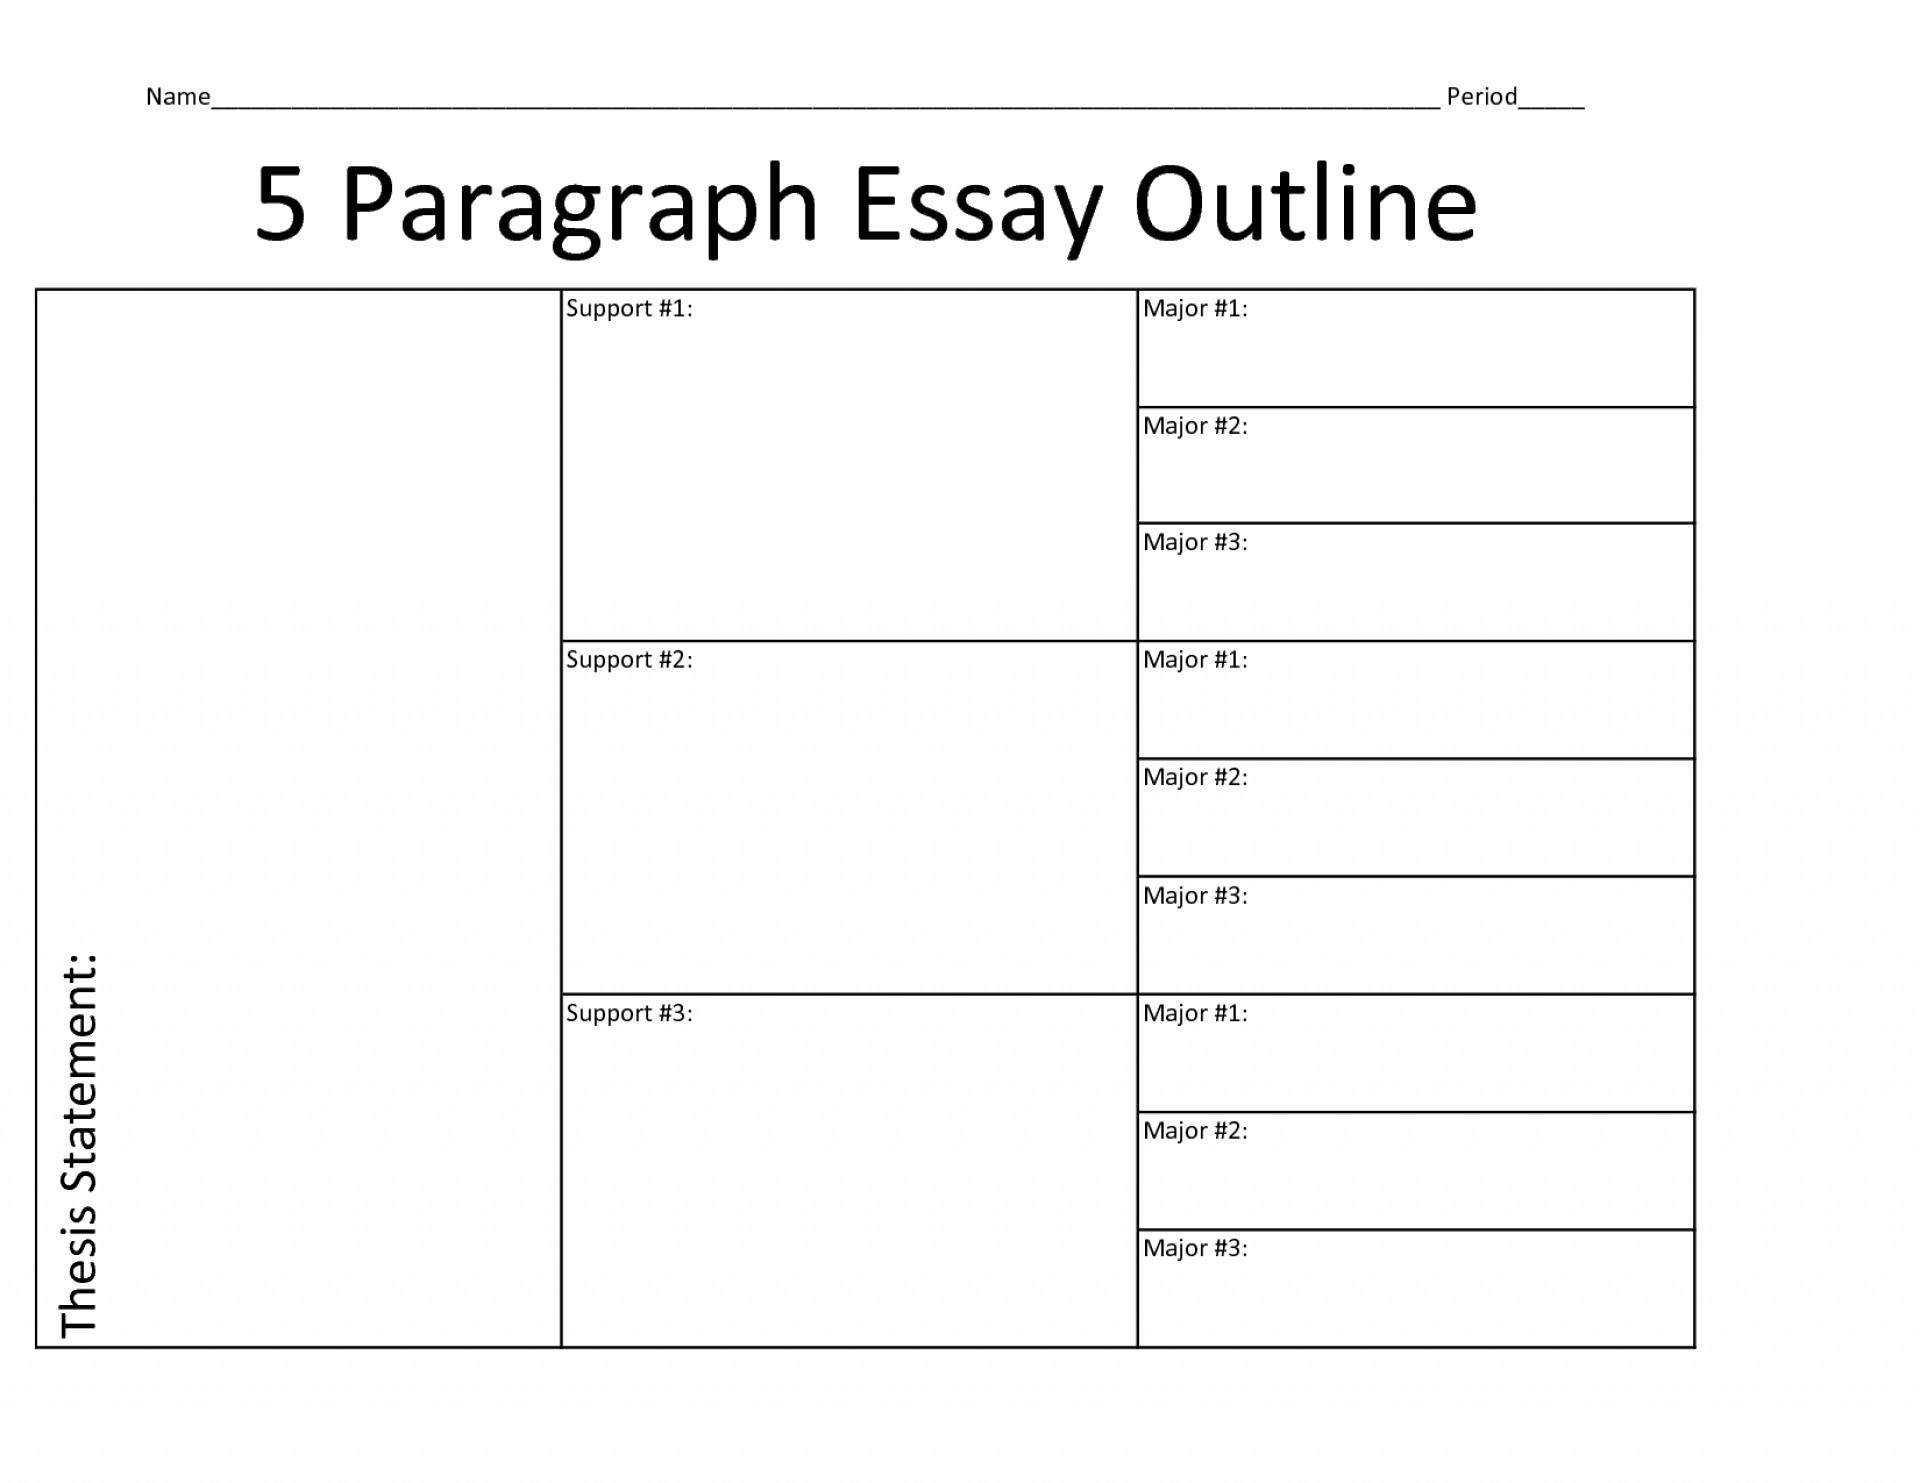 009 Essay Example Template Excellent Outline Mla Argumentative High School Research Paper Pdf 1920